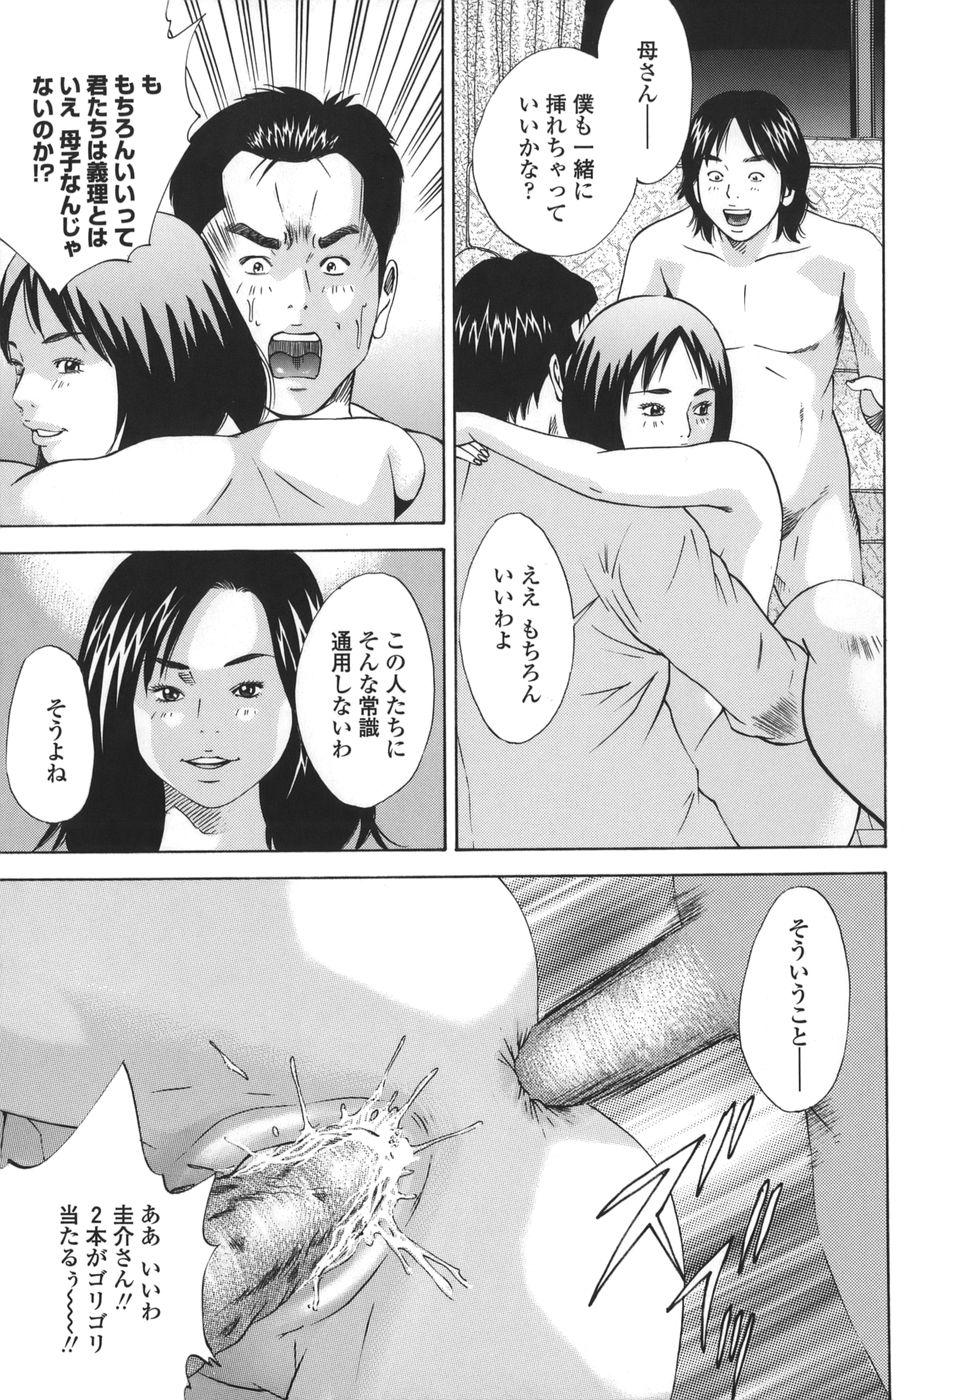 Kinshin Goukan - Near Relation Rapes 120